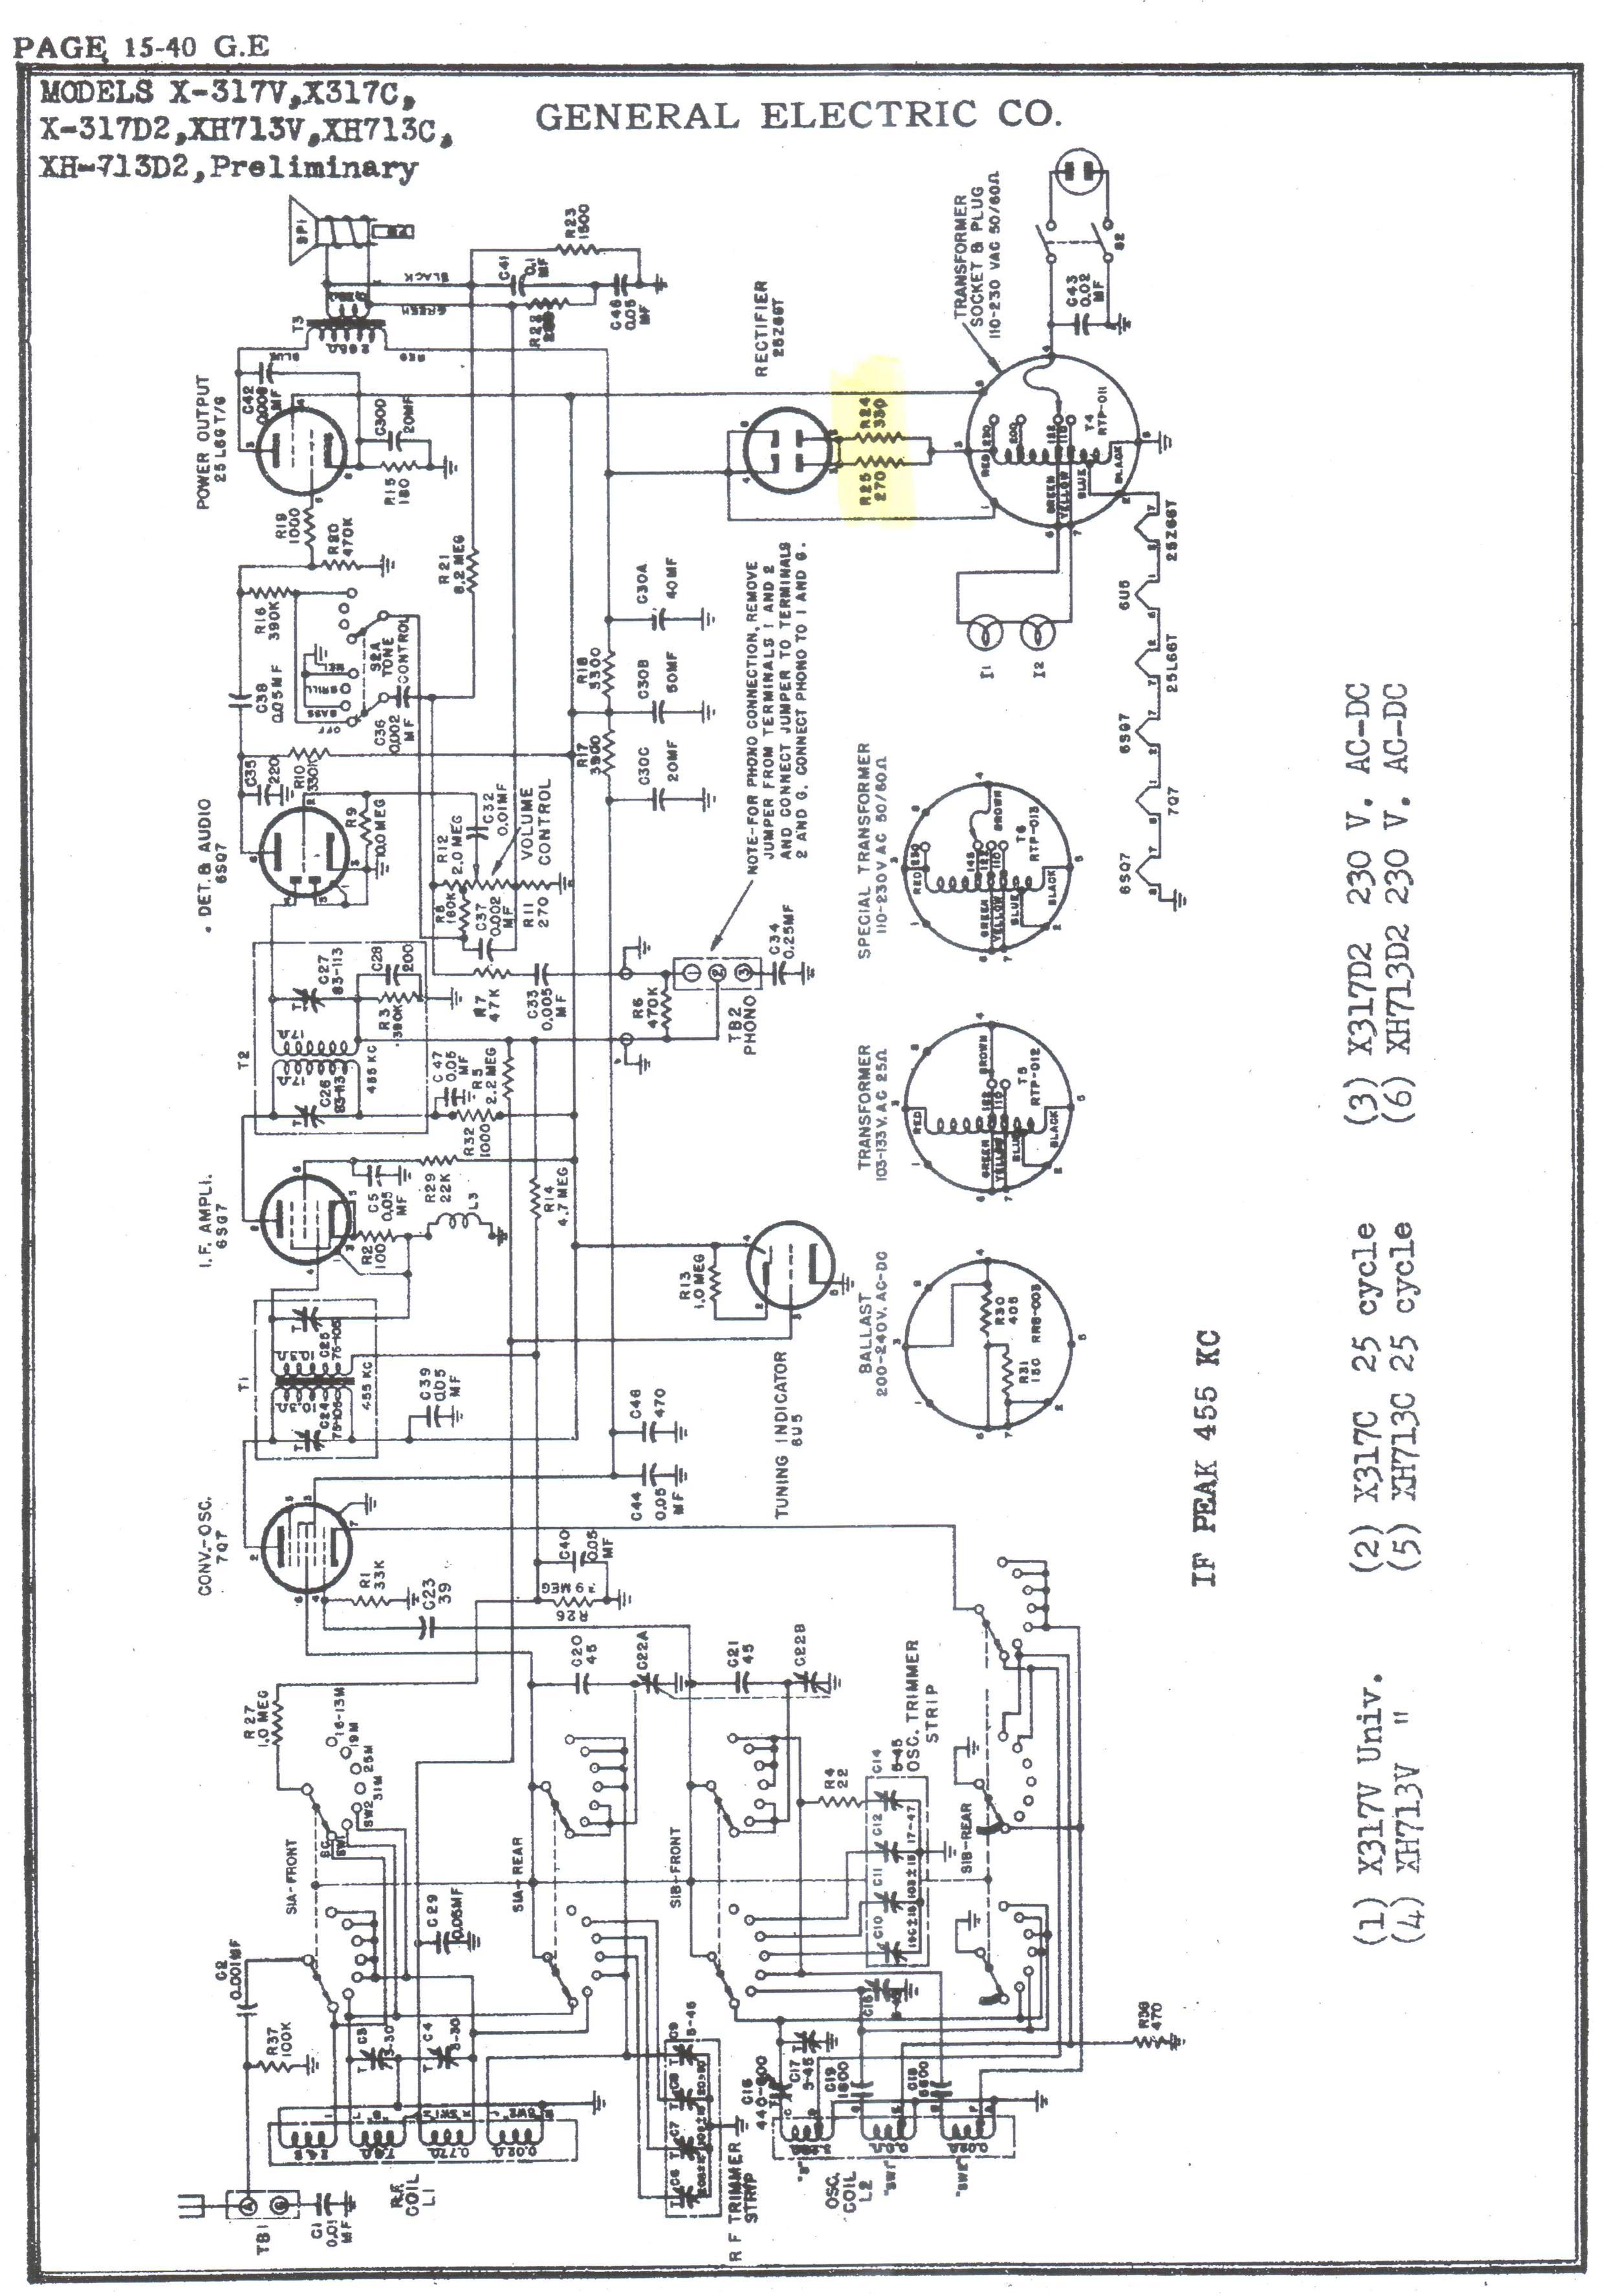 10 Ohm 25 Watt Resistor